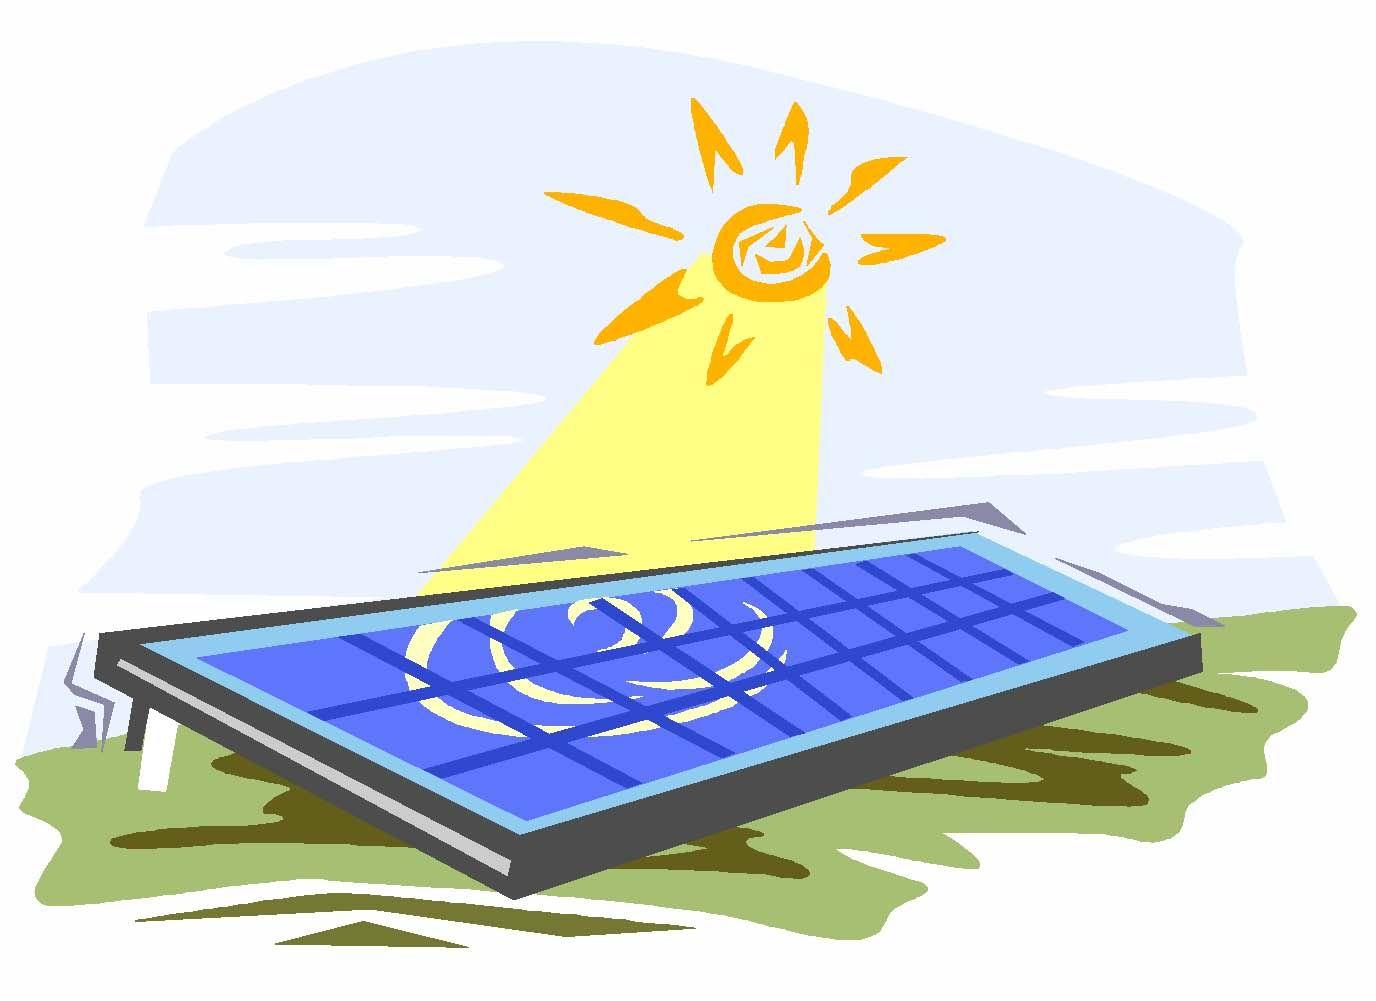 5 most important predictions nostradamus prophecies in 2017 rh pinterest com solar energy clipart solar energy clipart images